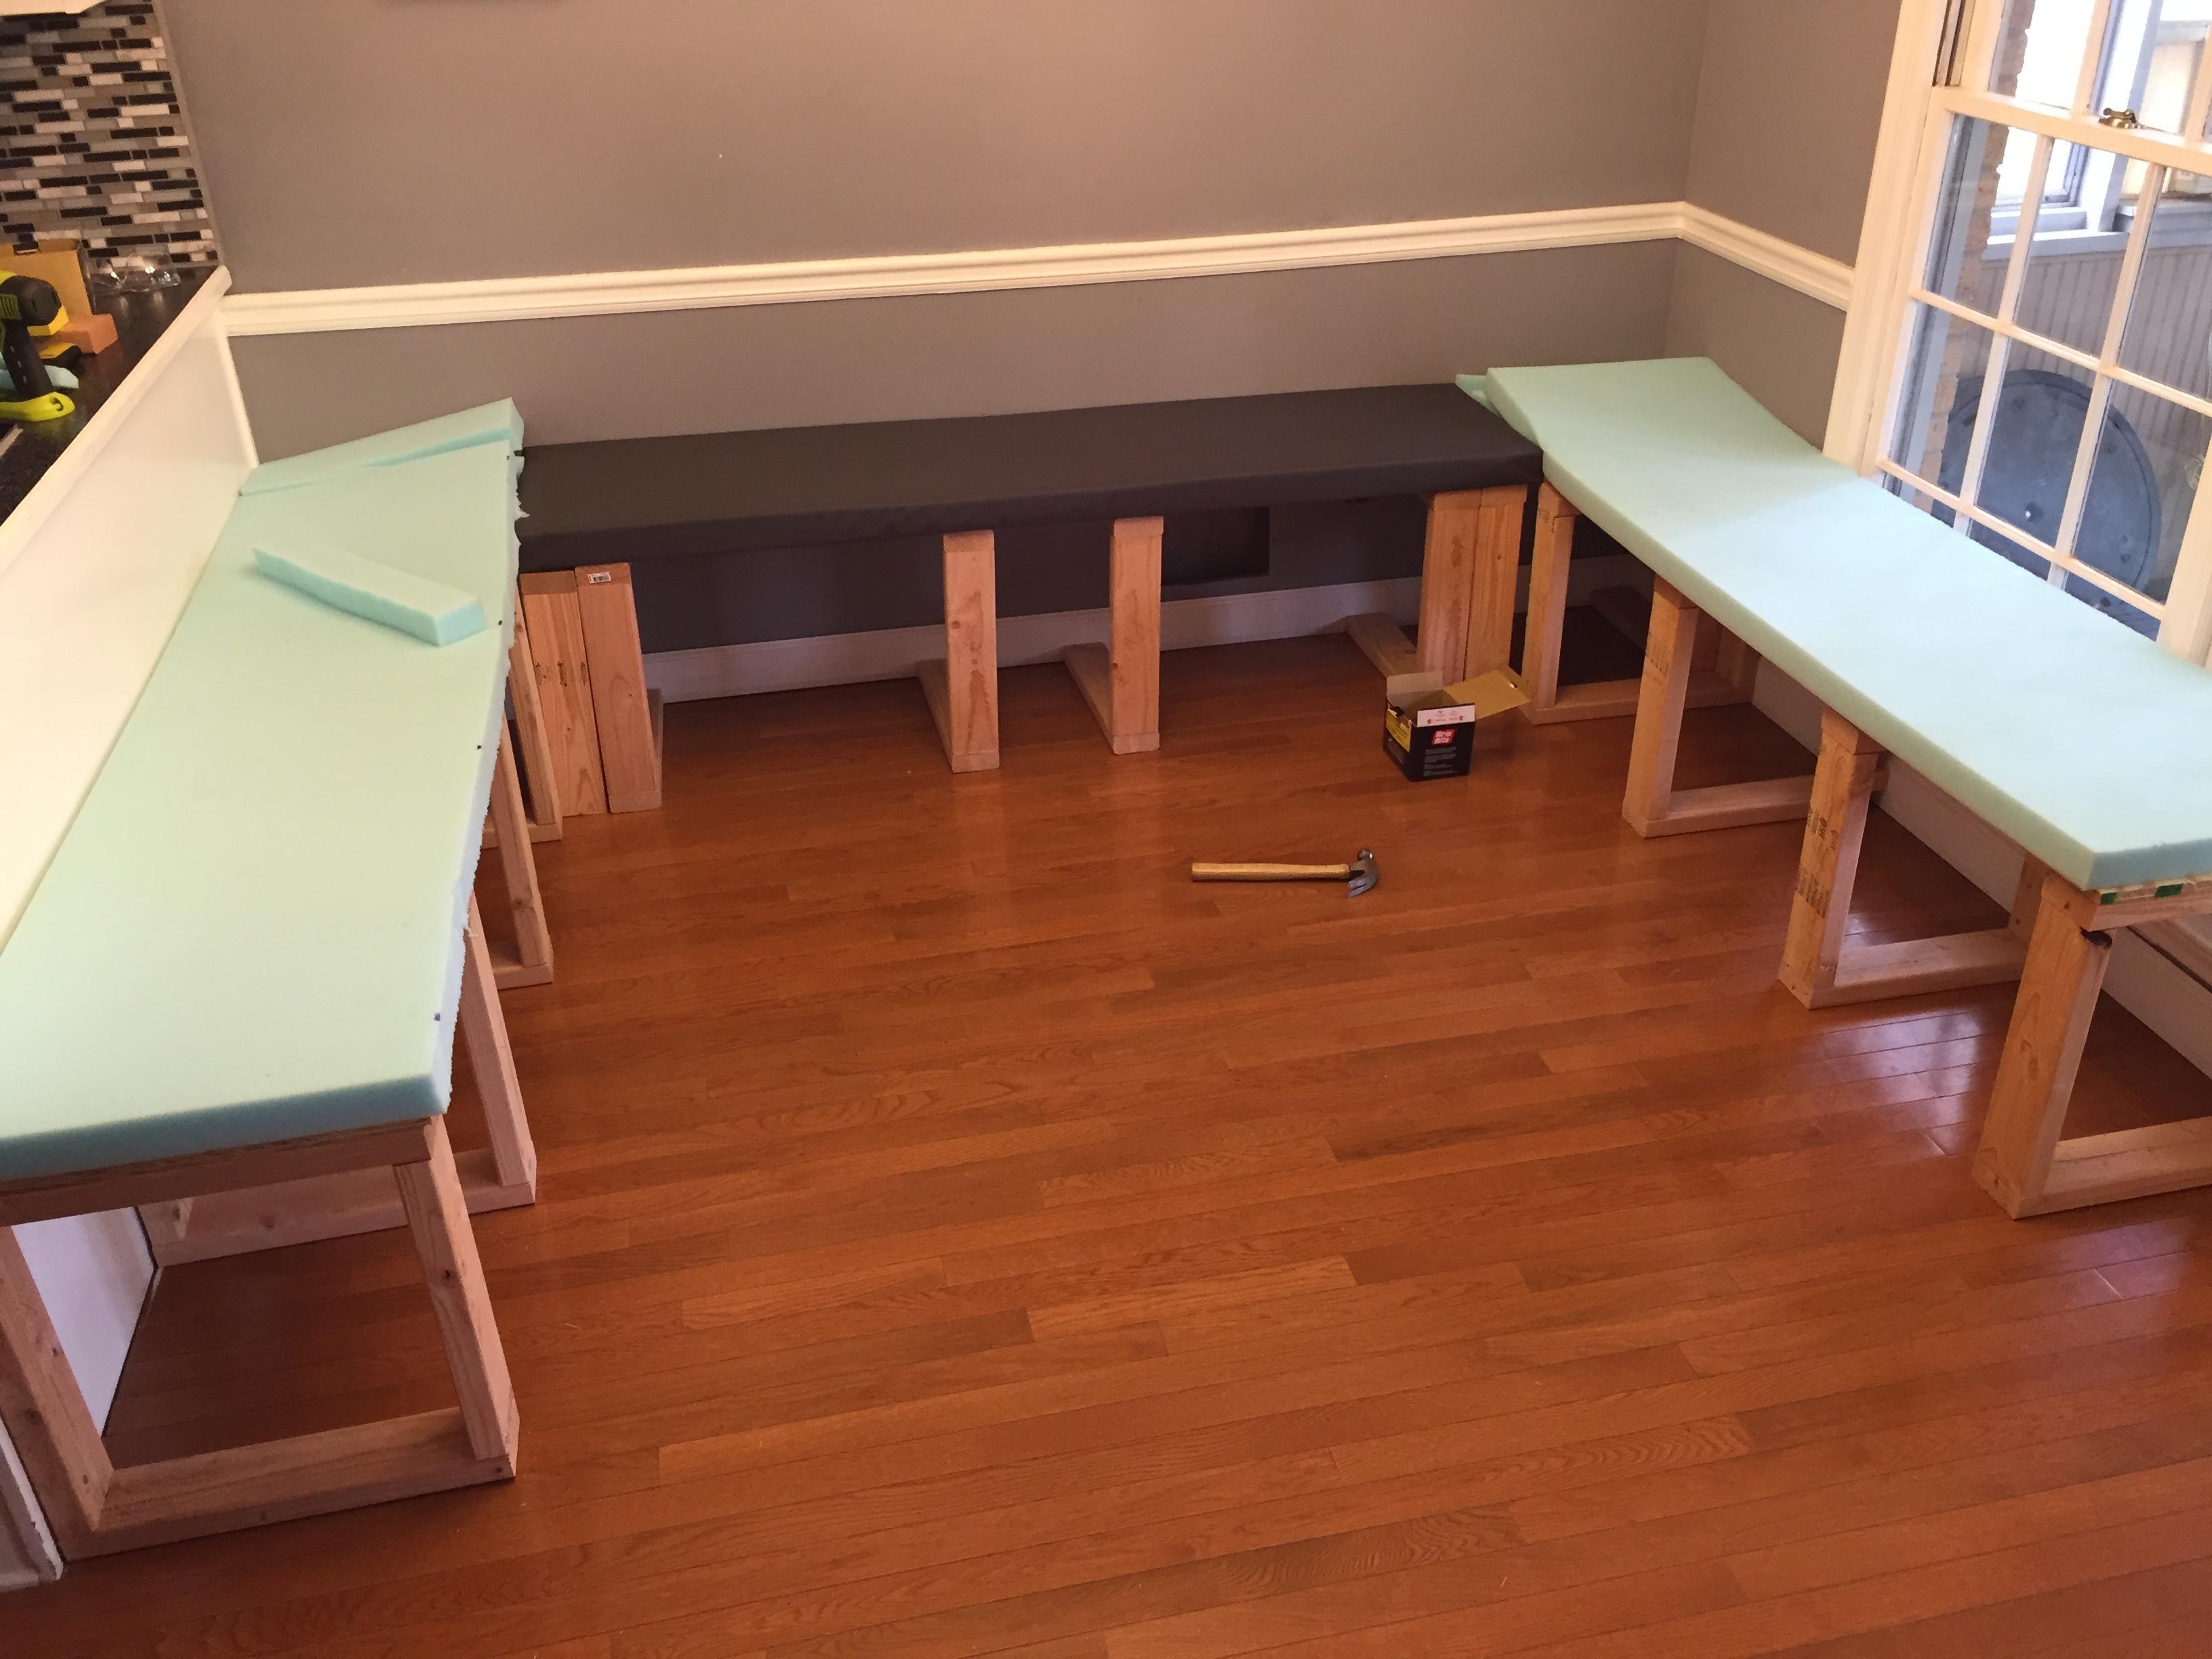 Moss Green 4 Piece Nook Cushion Set Corner Bench Booth Dining